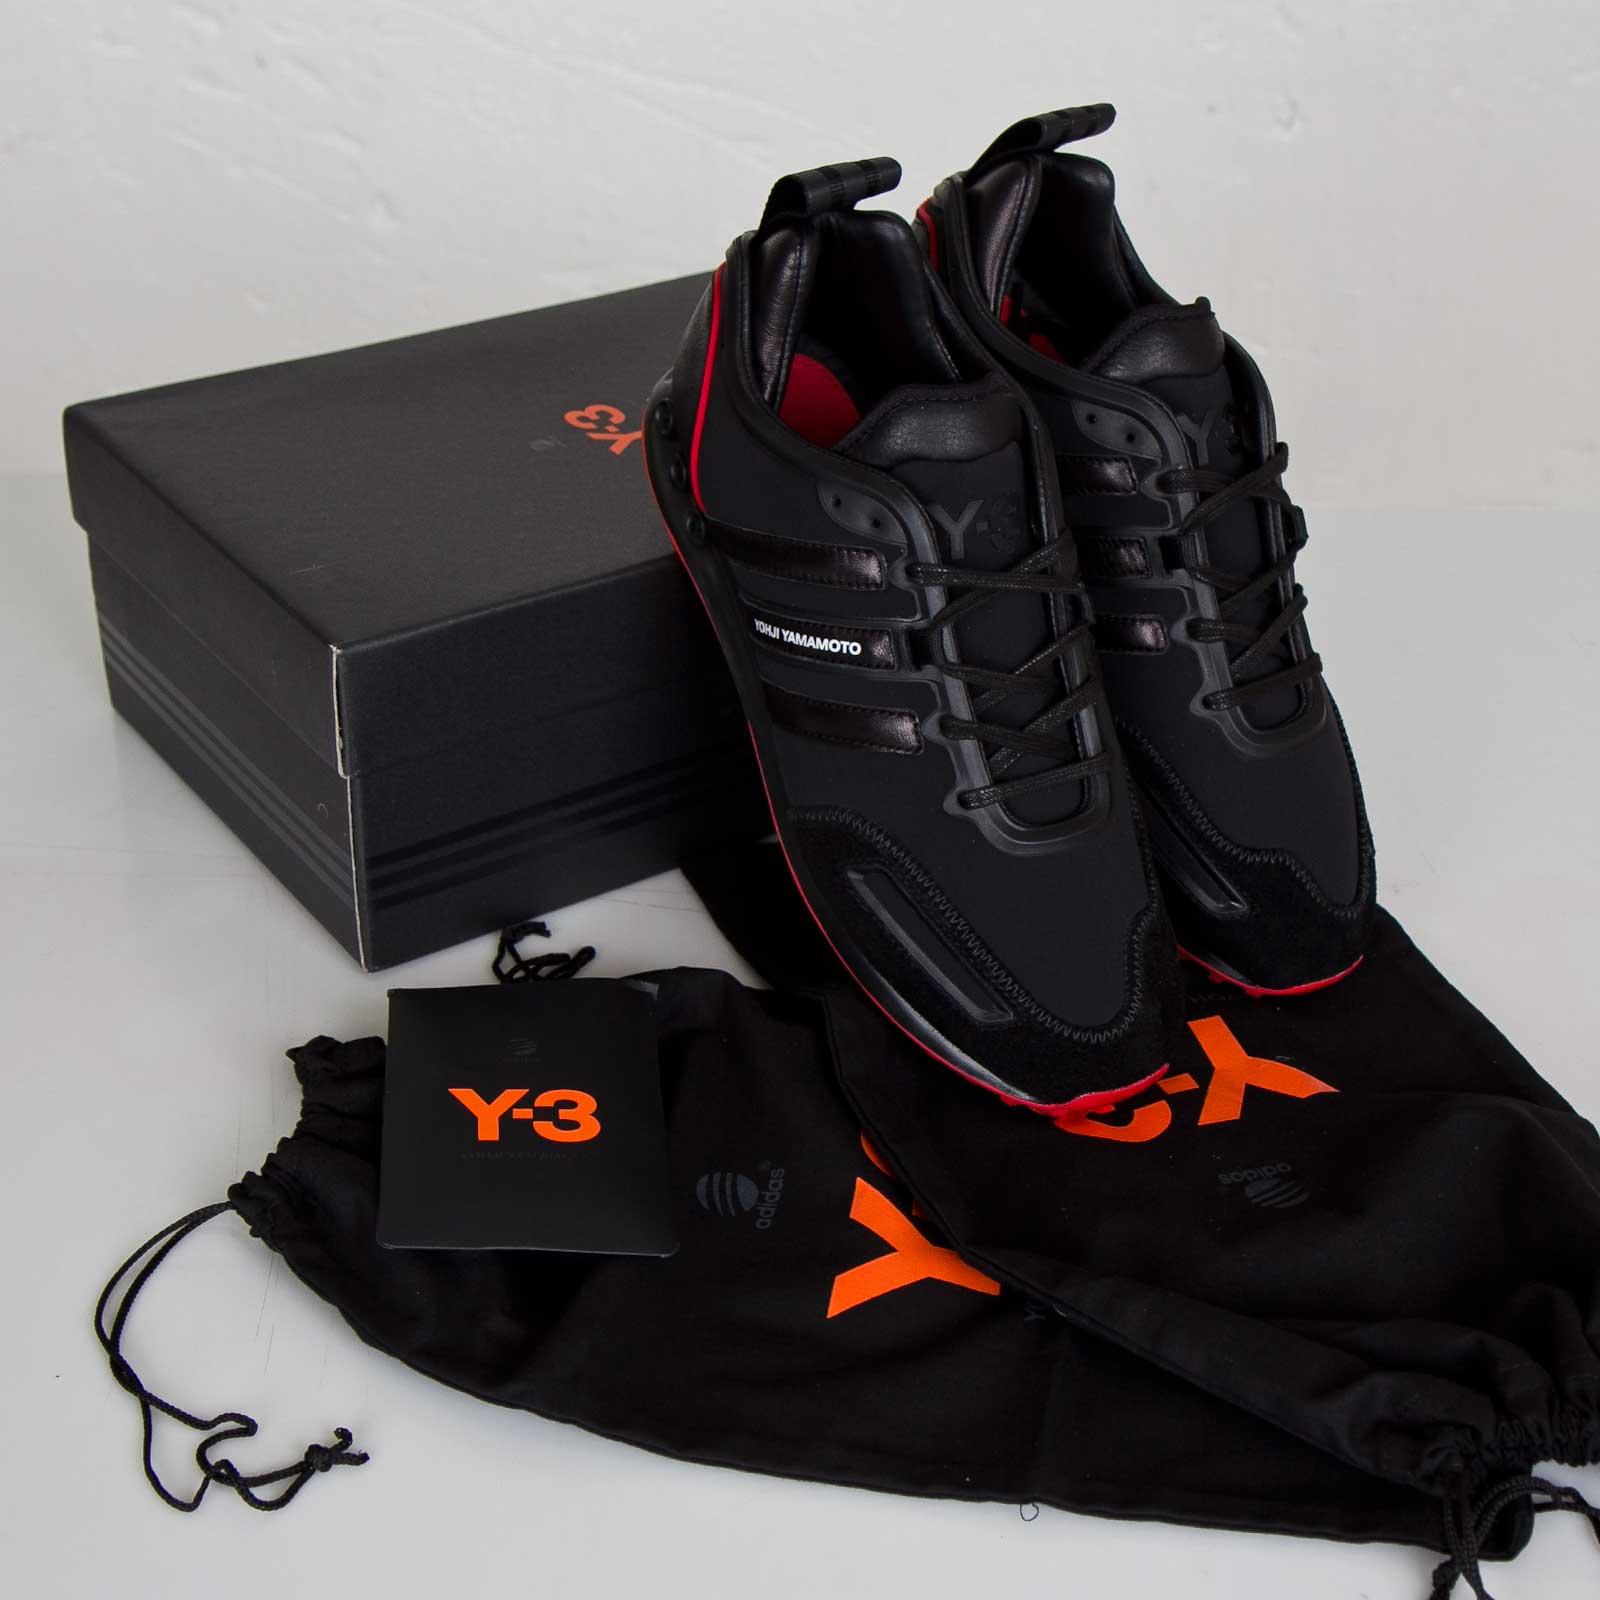 f104c4558f039 adidas Y-3 Tokio Trainer - M25717 - Sneakersnstuff